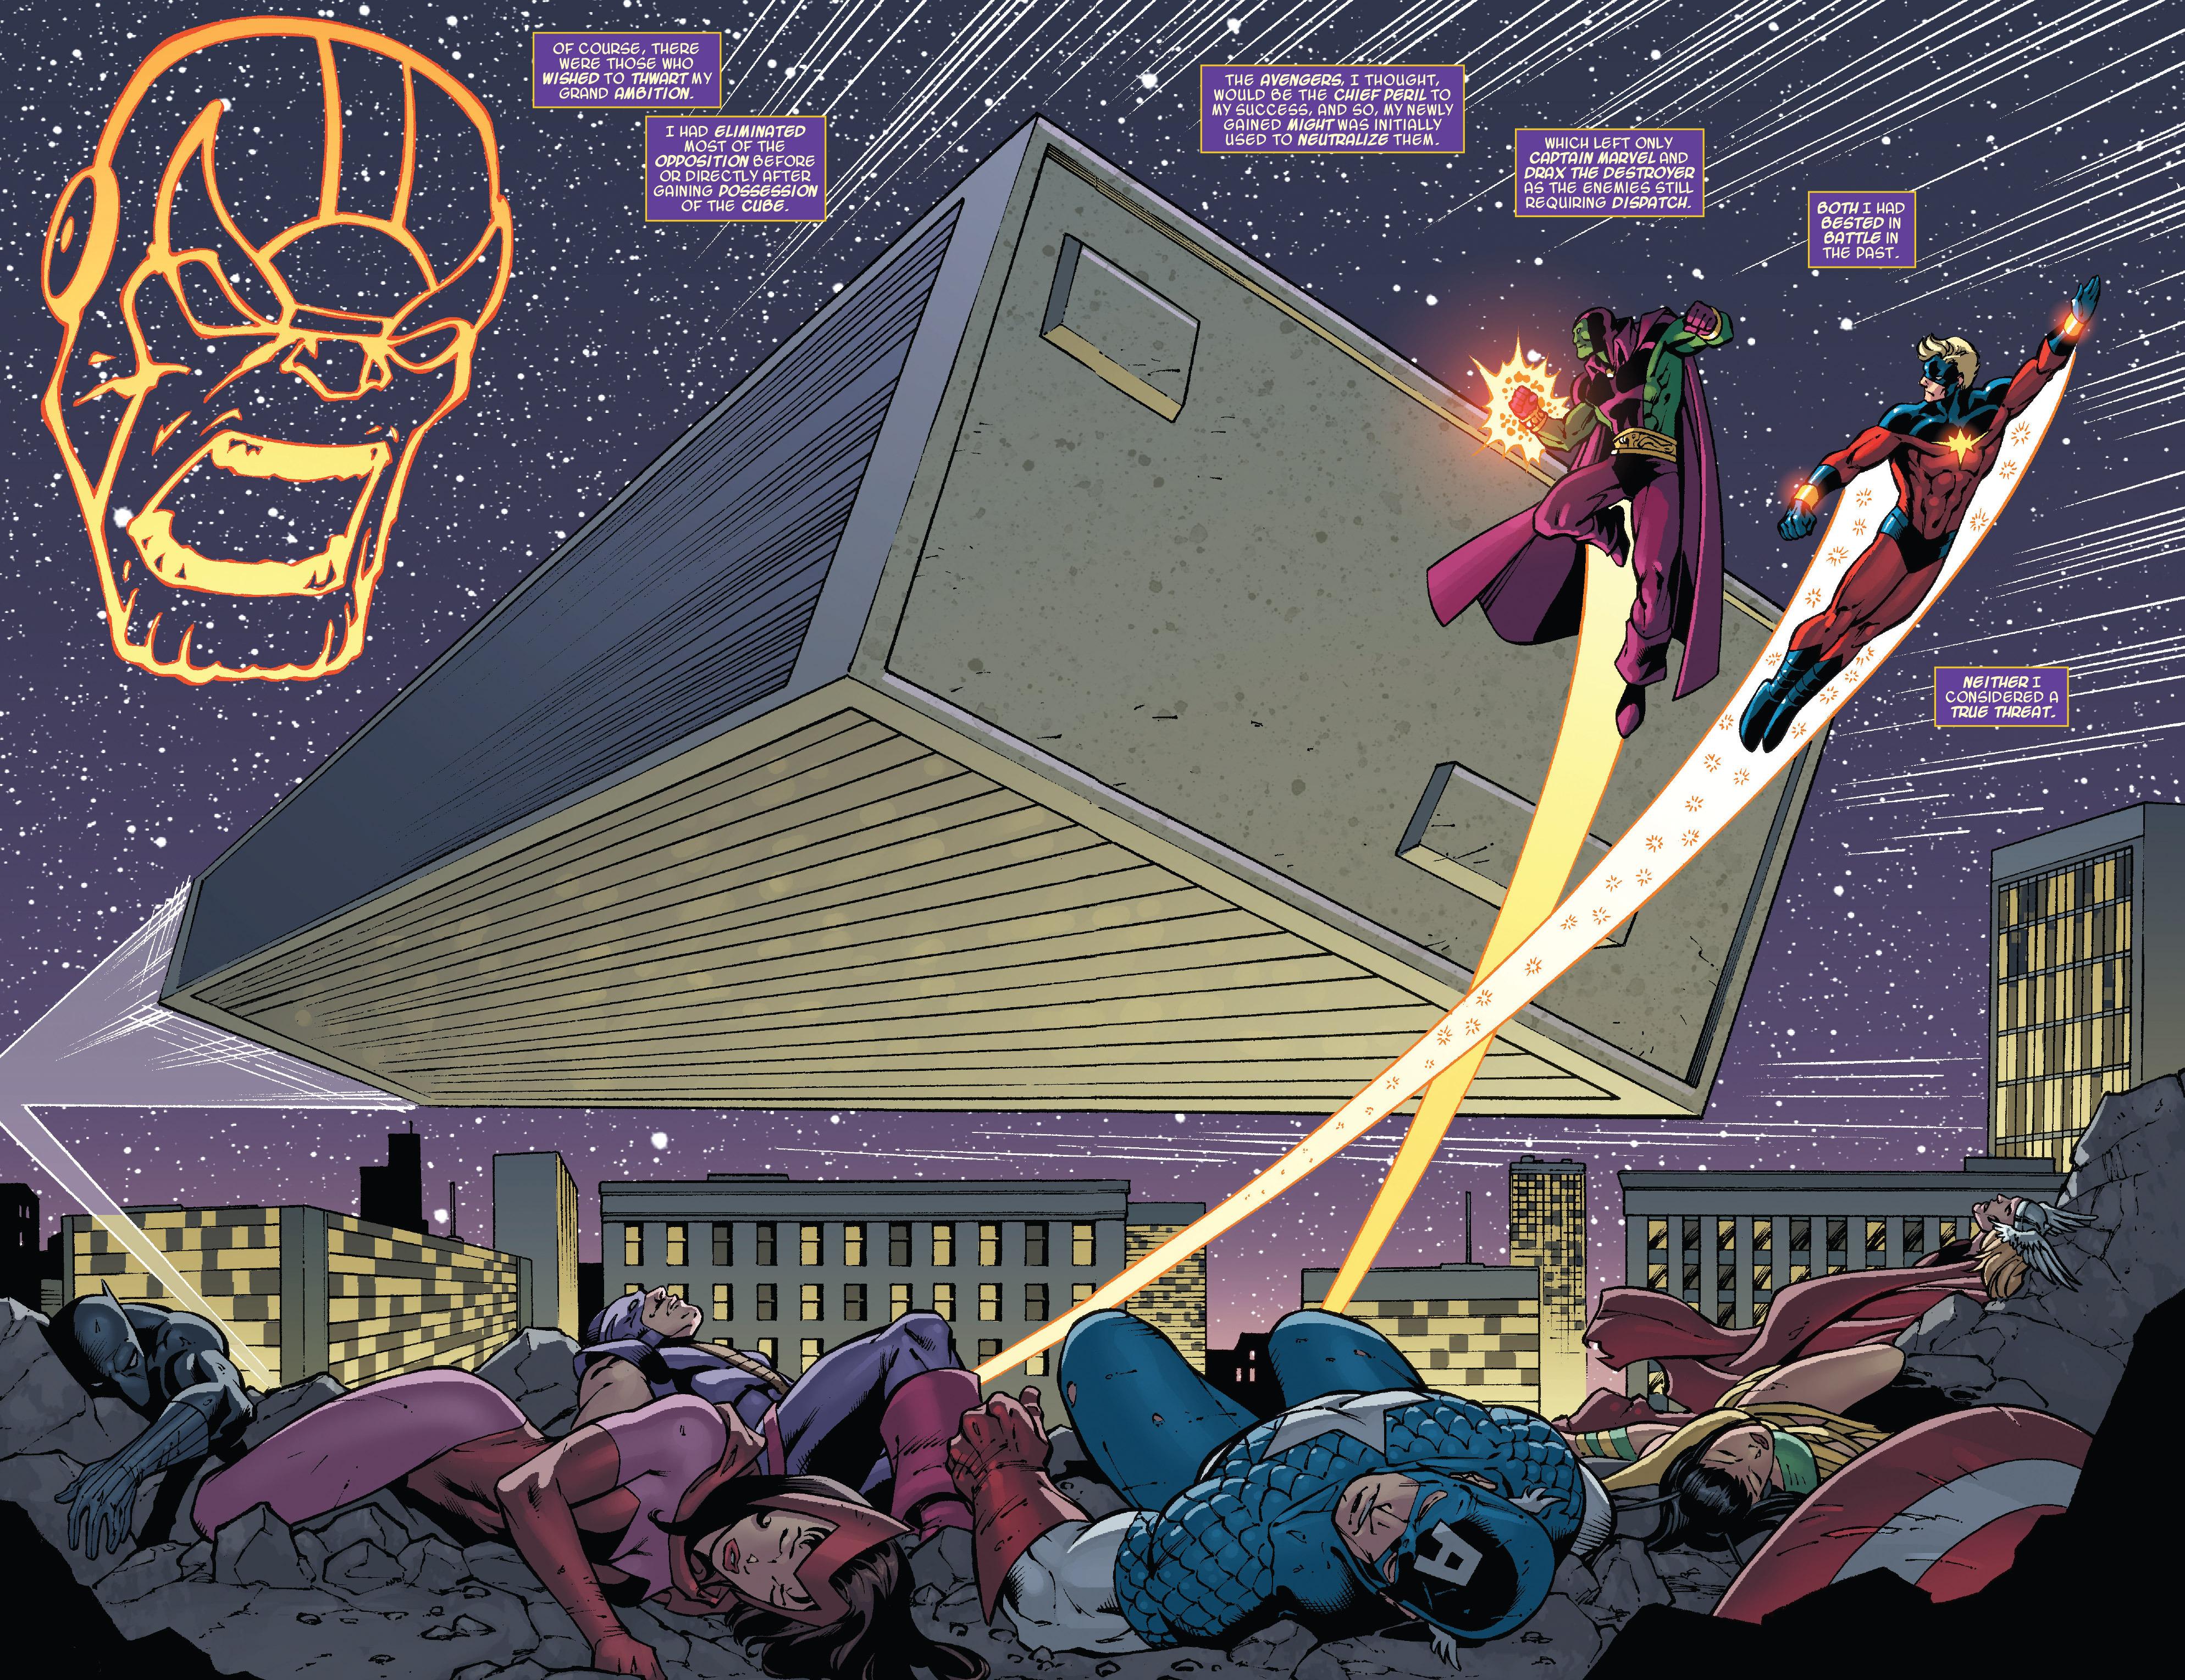 Read online Thanos Annual comic -  Issue # Annual - 4